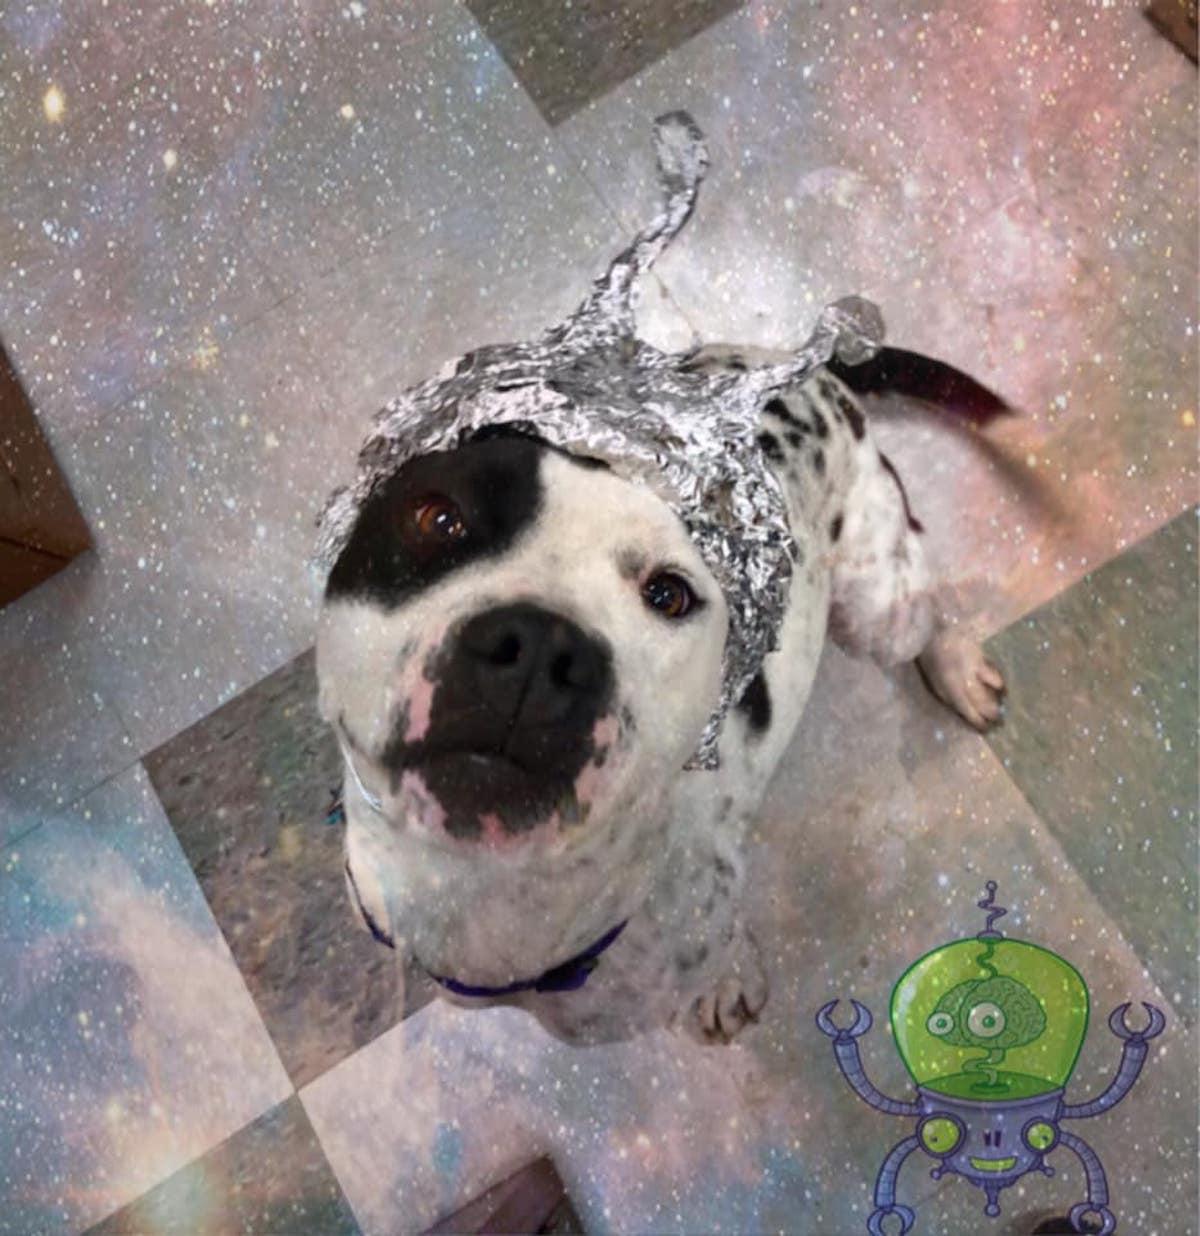 OKC Animal Welfare Animaux extraterrestres